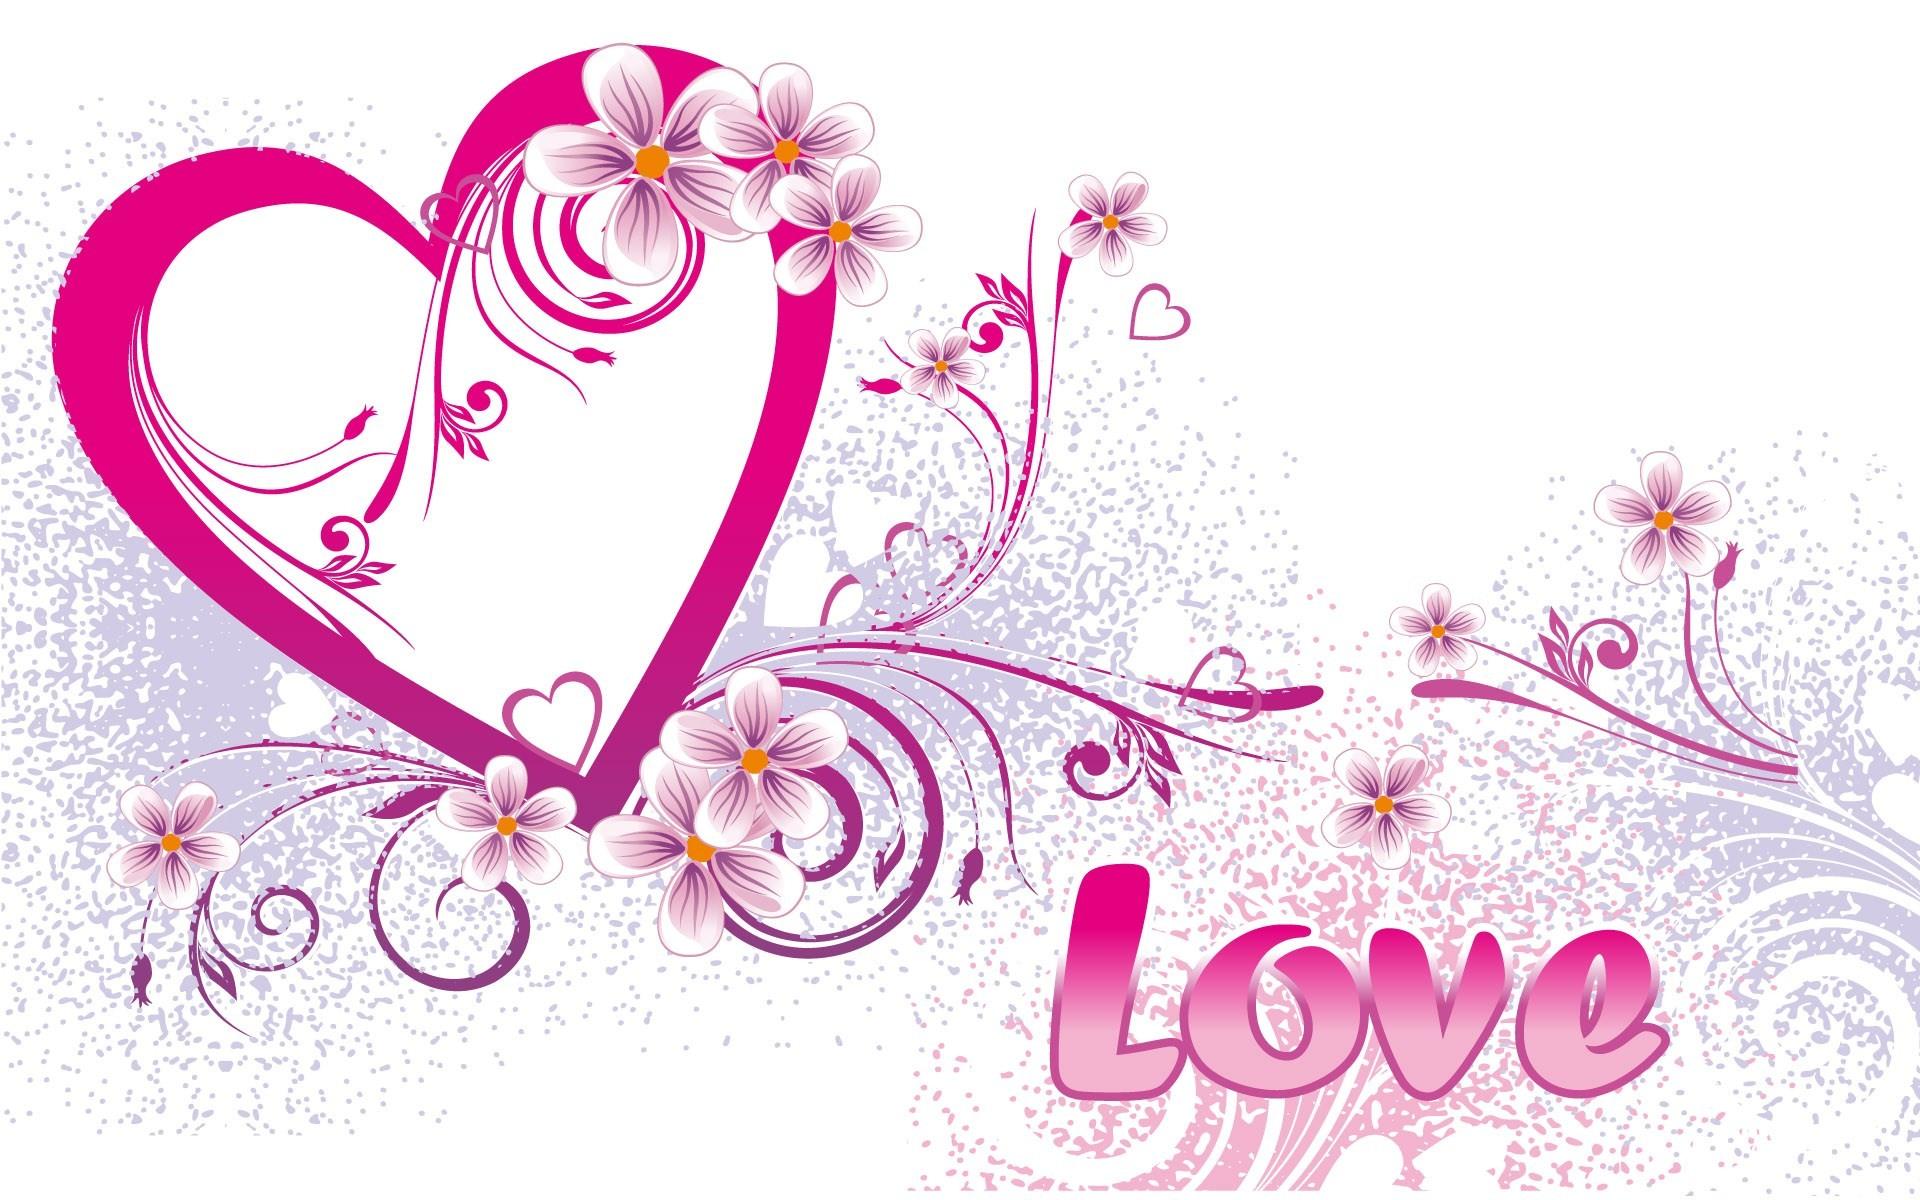 2560x1440 desktop screensaver button - Valentines Day Screensavers